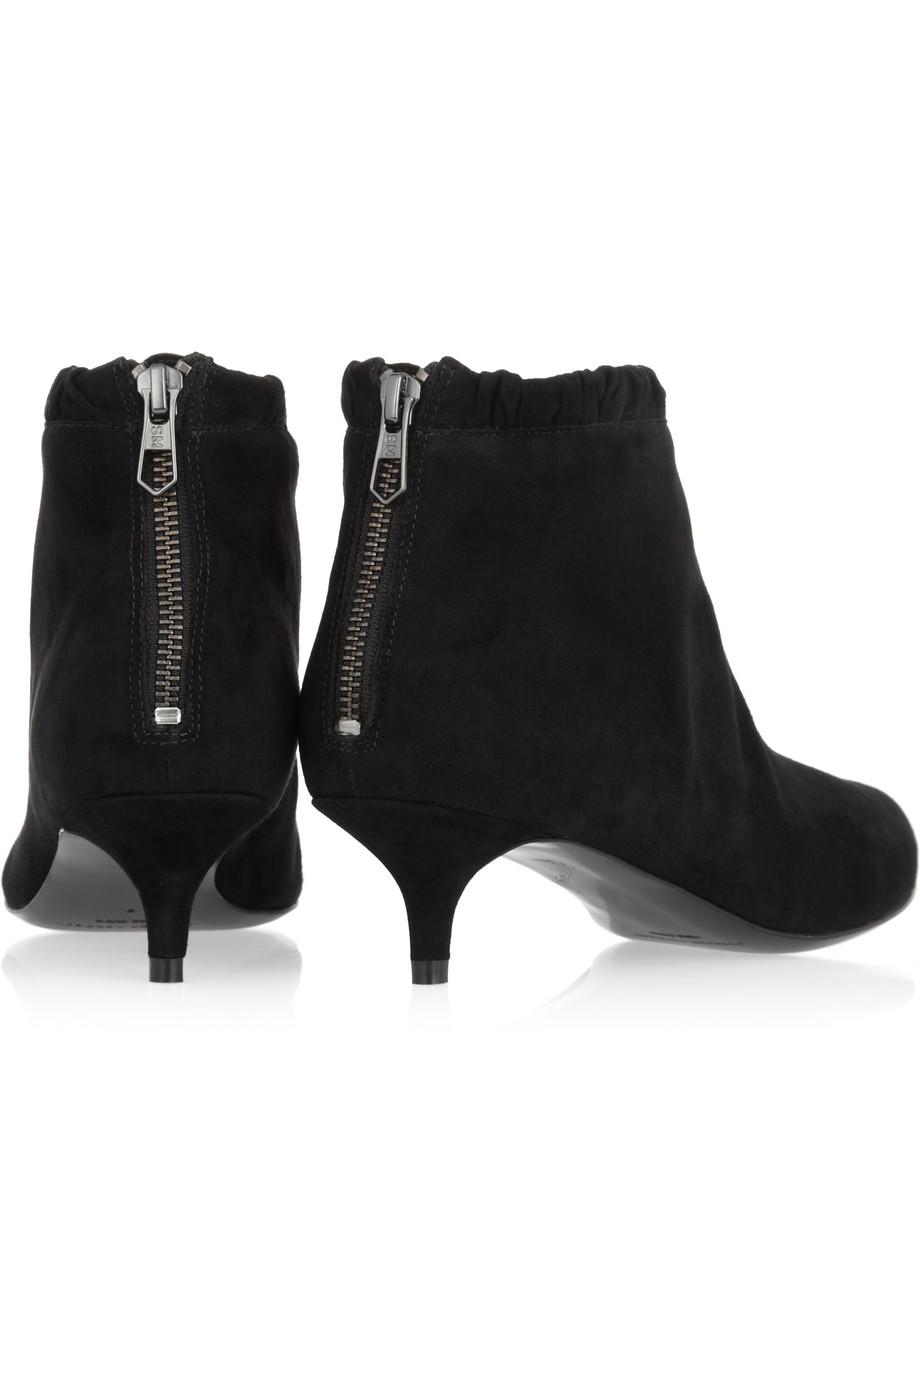 9c0d5042a1b Sigerson Morrison Black Suede Kitten Heel Ankle Boots